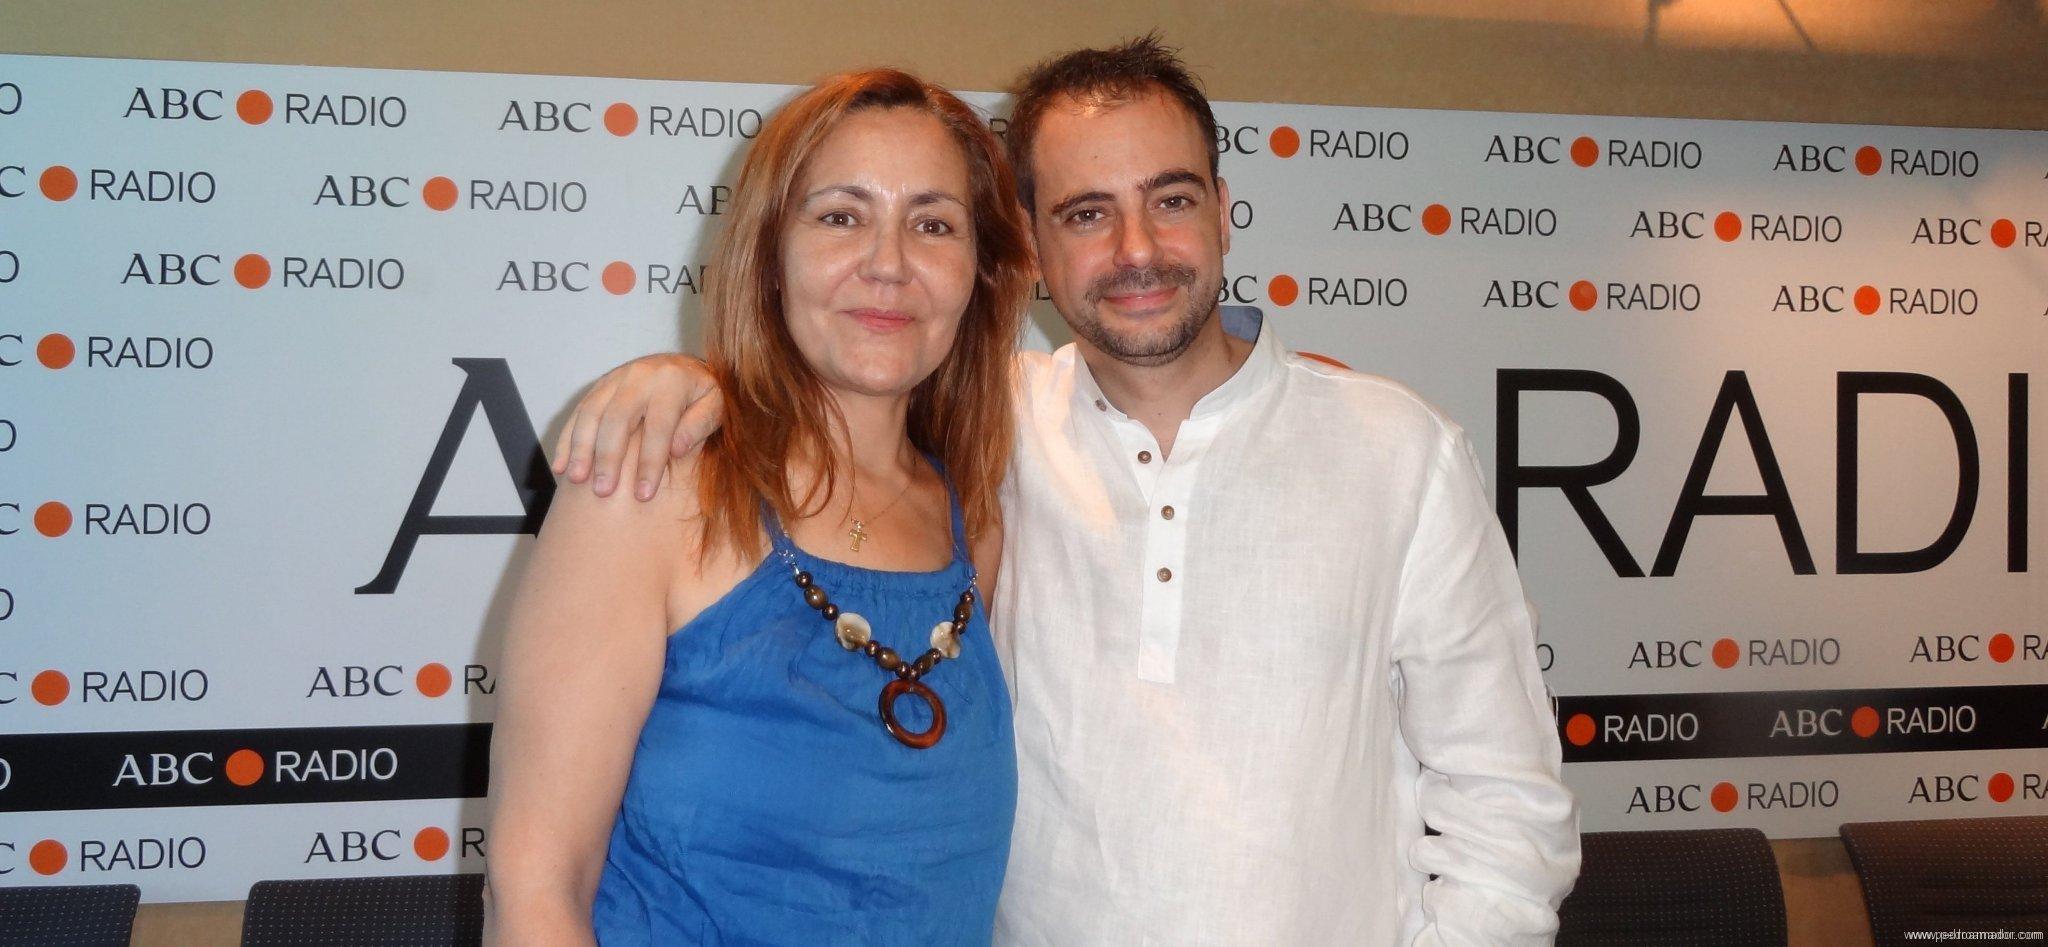 Entrevista ABC Punto Radio es Esther Pedraza